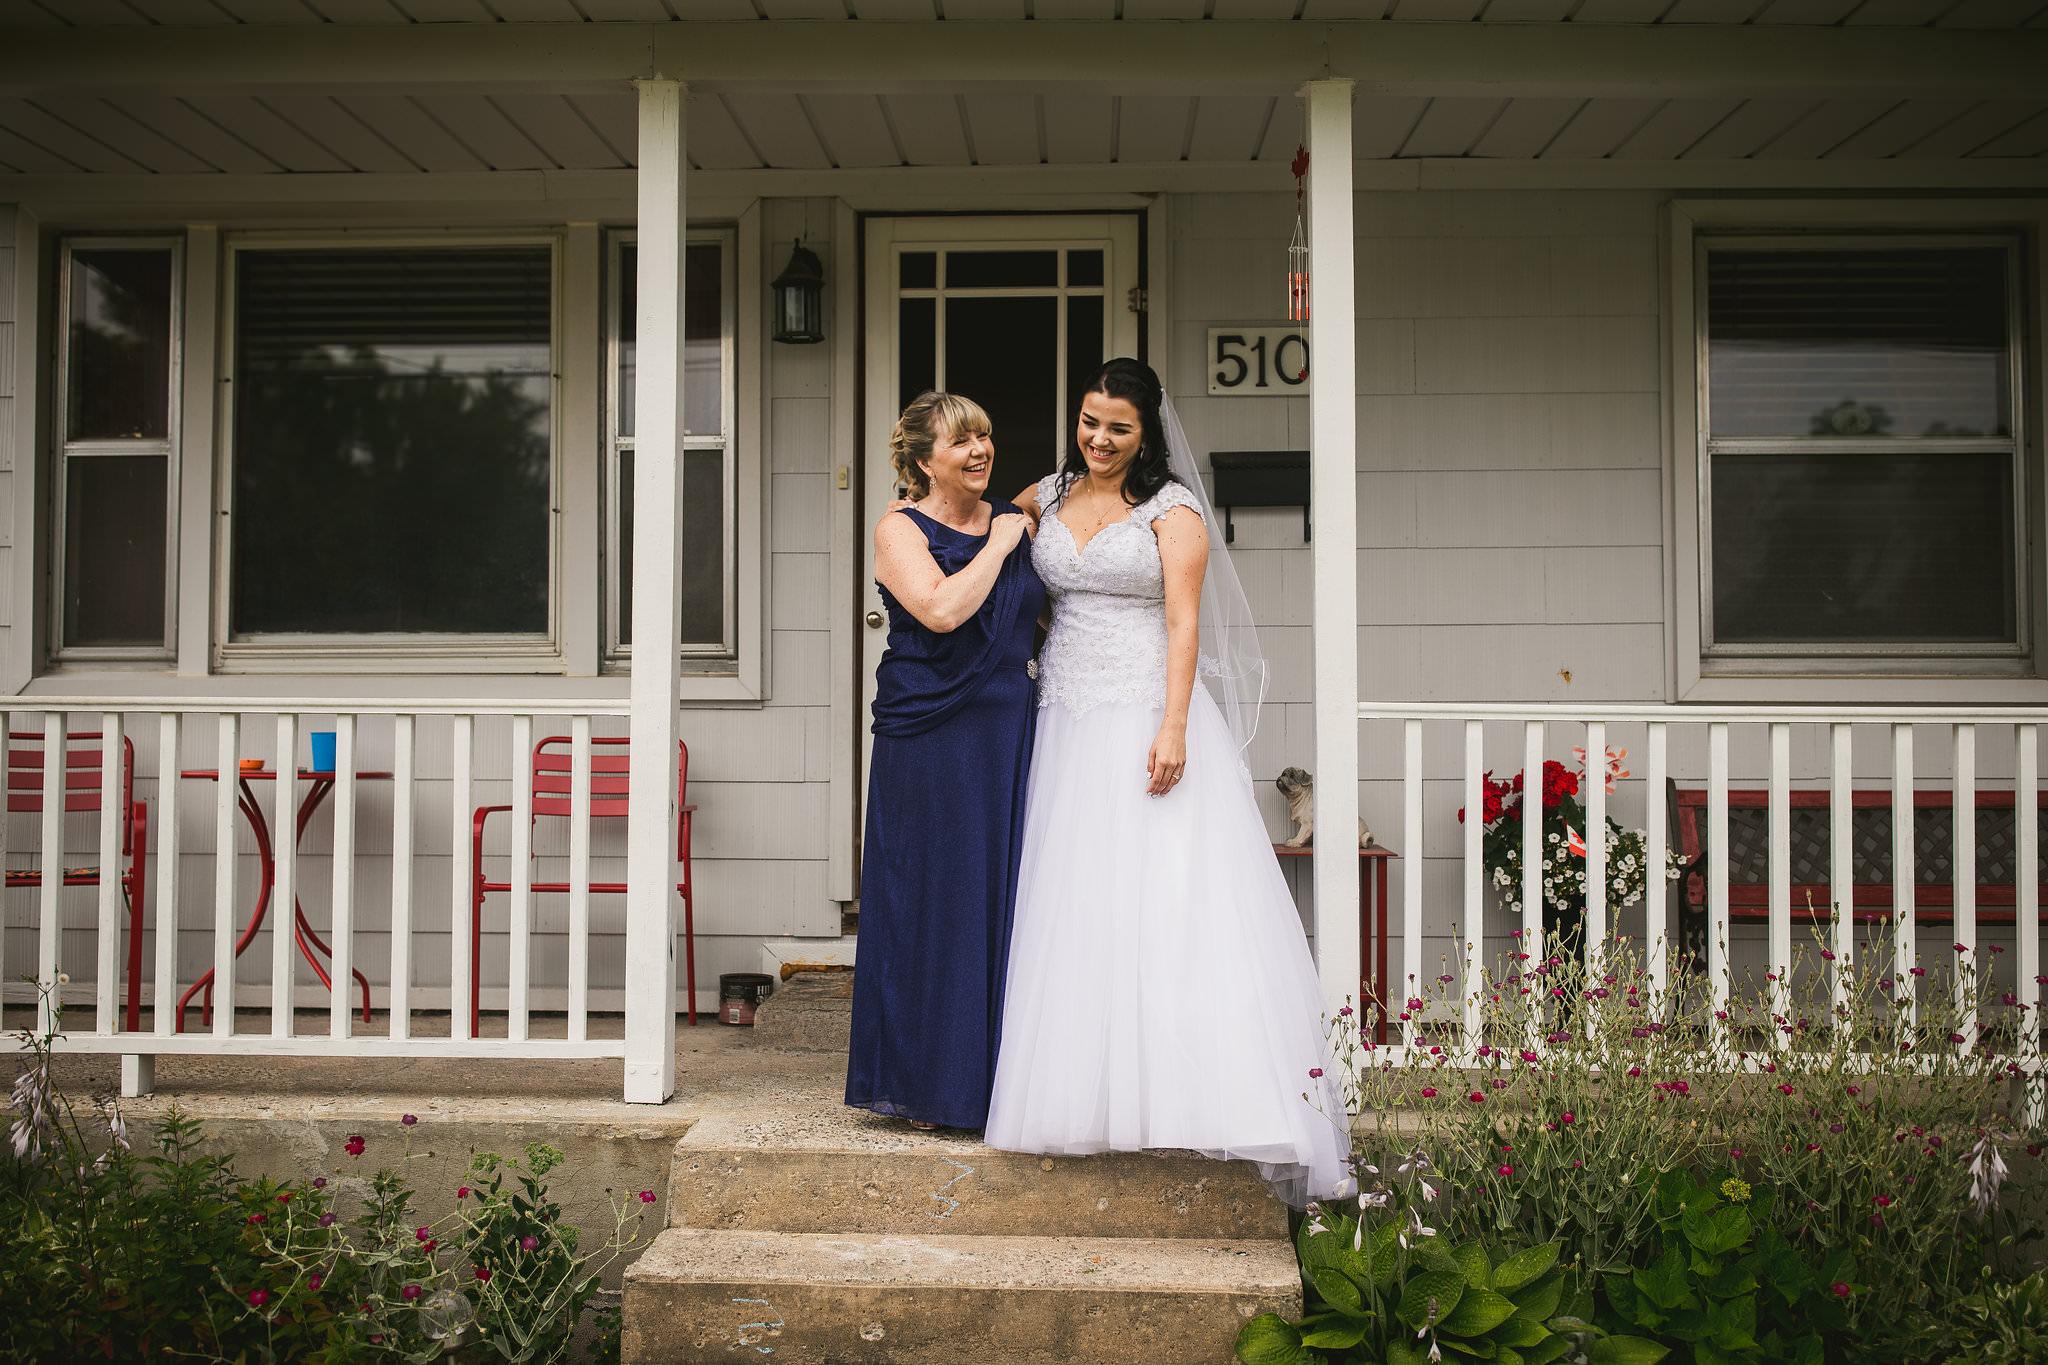 Kristen Adam Kindred Loft Whitby Wedding Photos 88 - Durham Wedding Photographer: Kindred Loft Wedding Photos